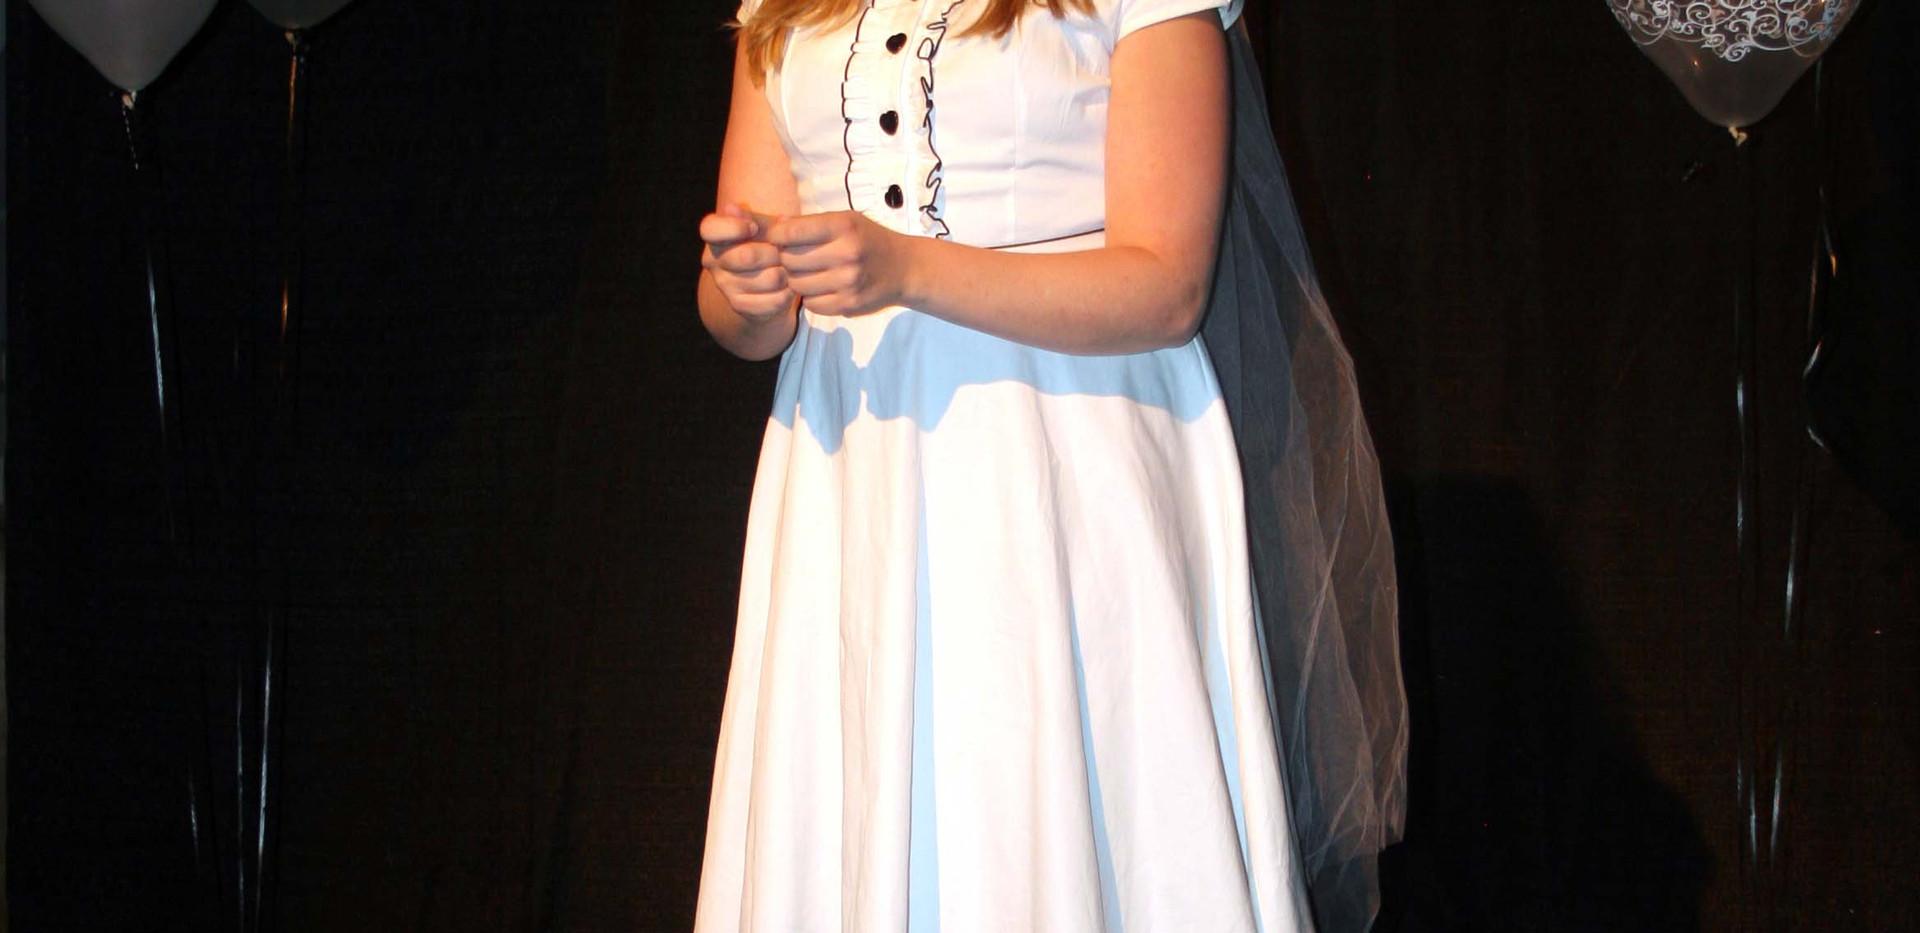 Eurydice - Eurydice in her Wedding Dress